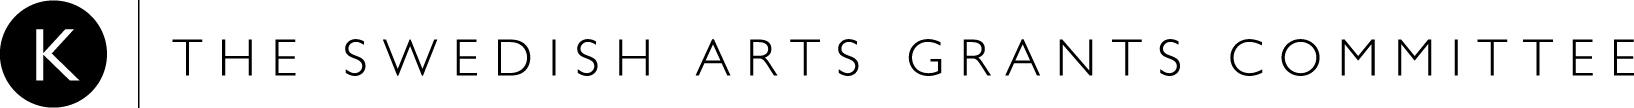 The Swedish Arts Council Logo